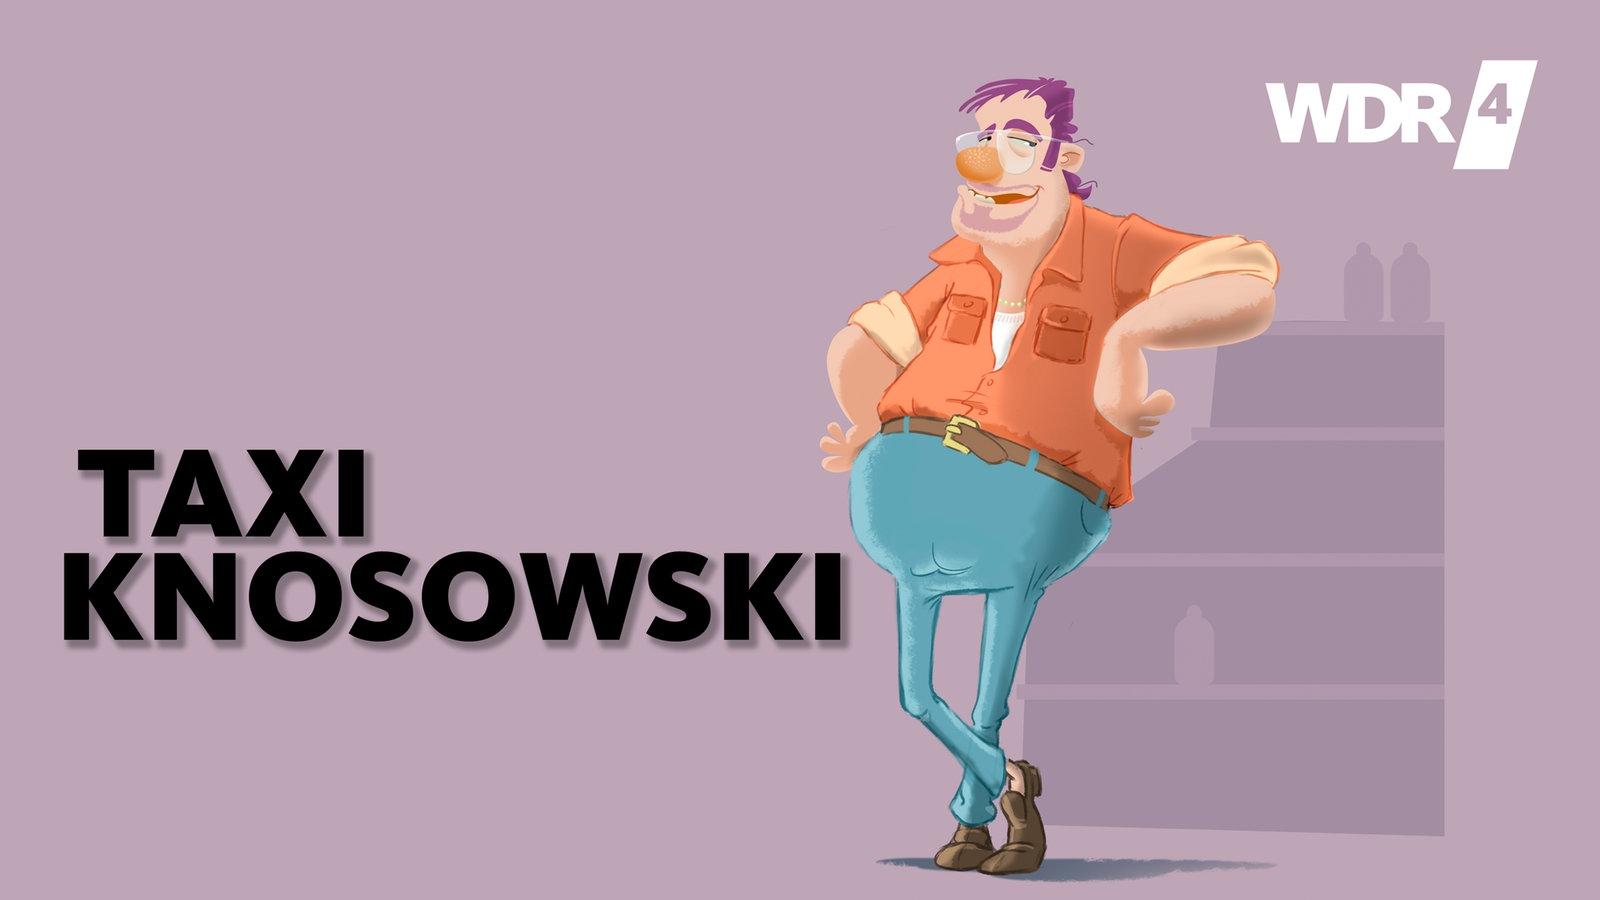 Taxi Knosowski Wdr 4